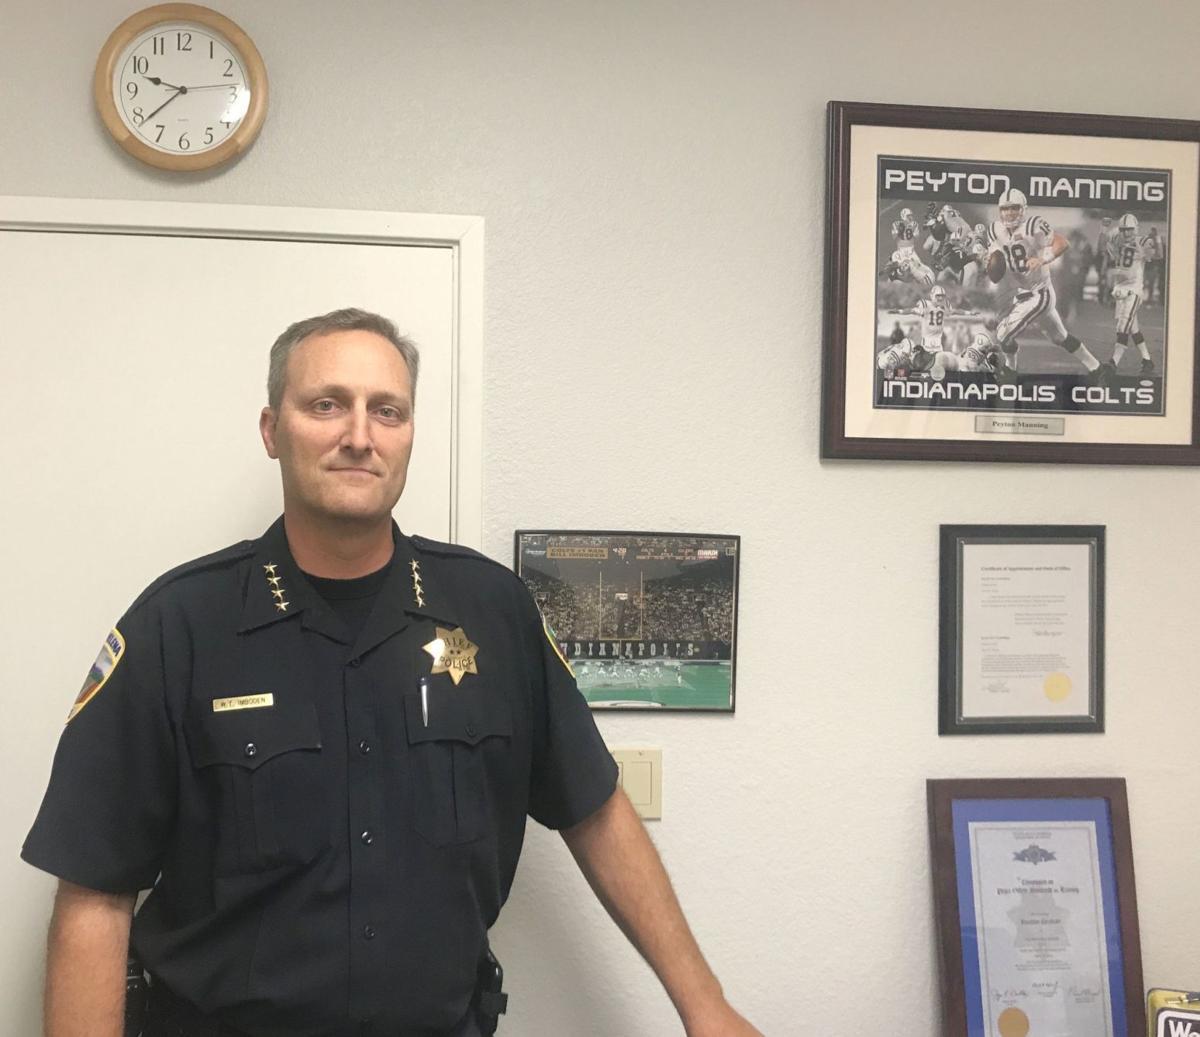 St. Helena Police Chief Bill Imboden